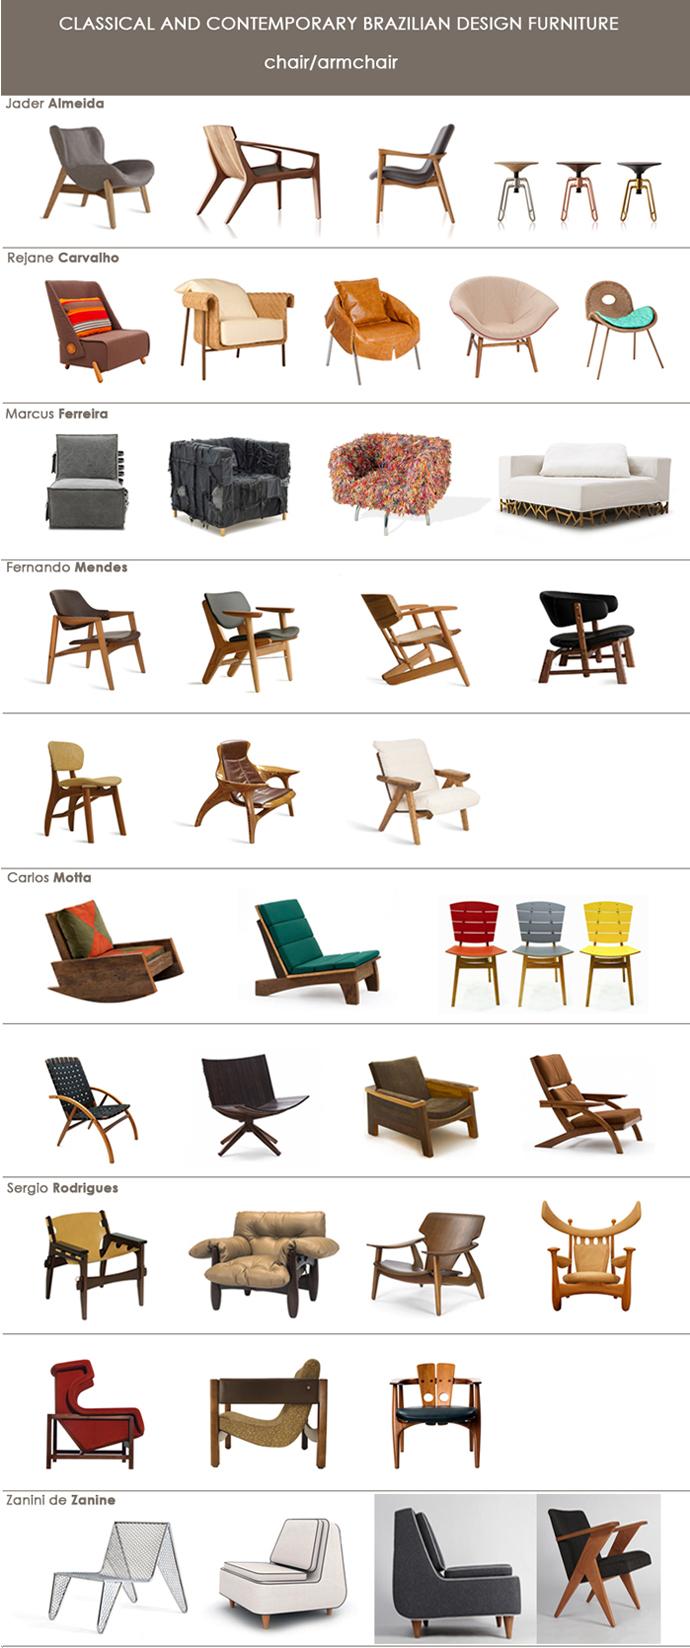 chairs_armchairs